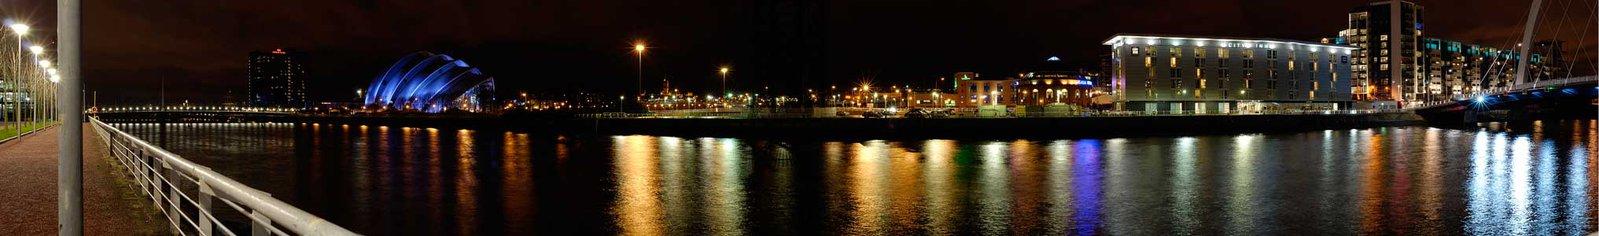 Night river pano 4